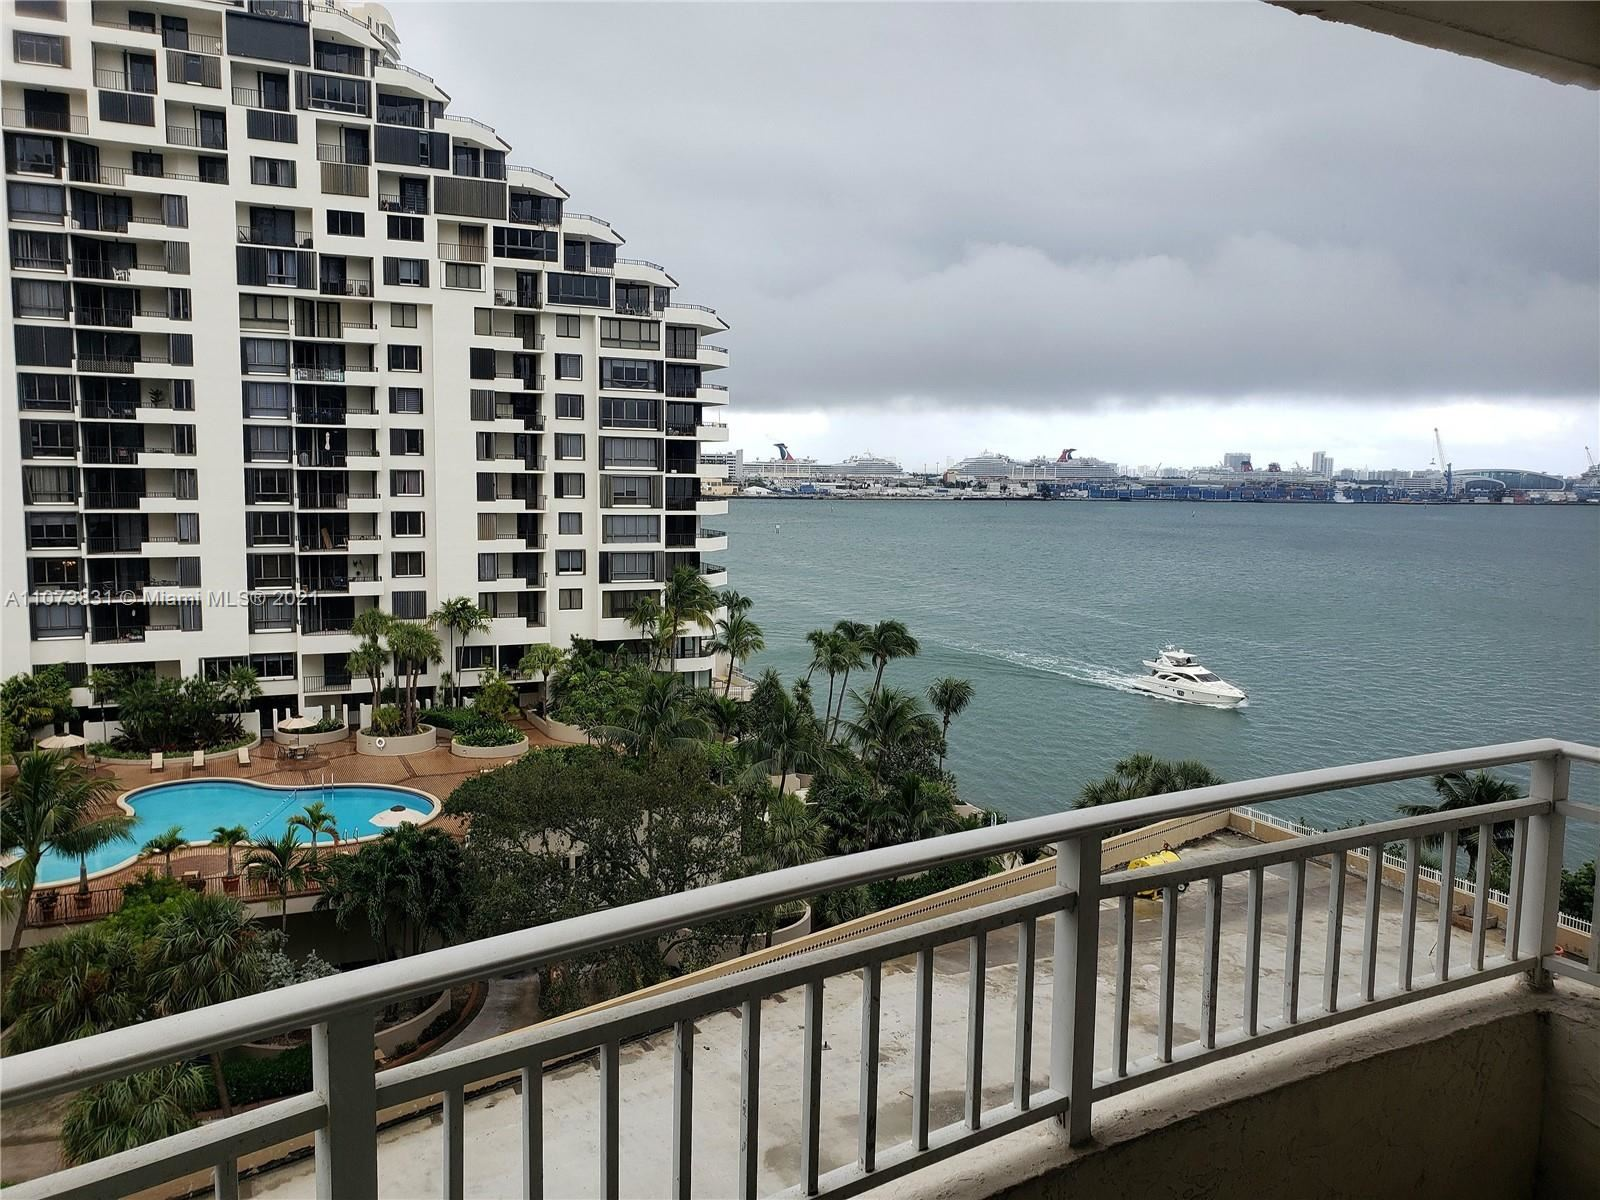 770 Claughton Island Dr #907, Miami, FL 33131 - #: A11073831